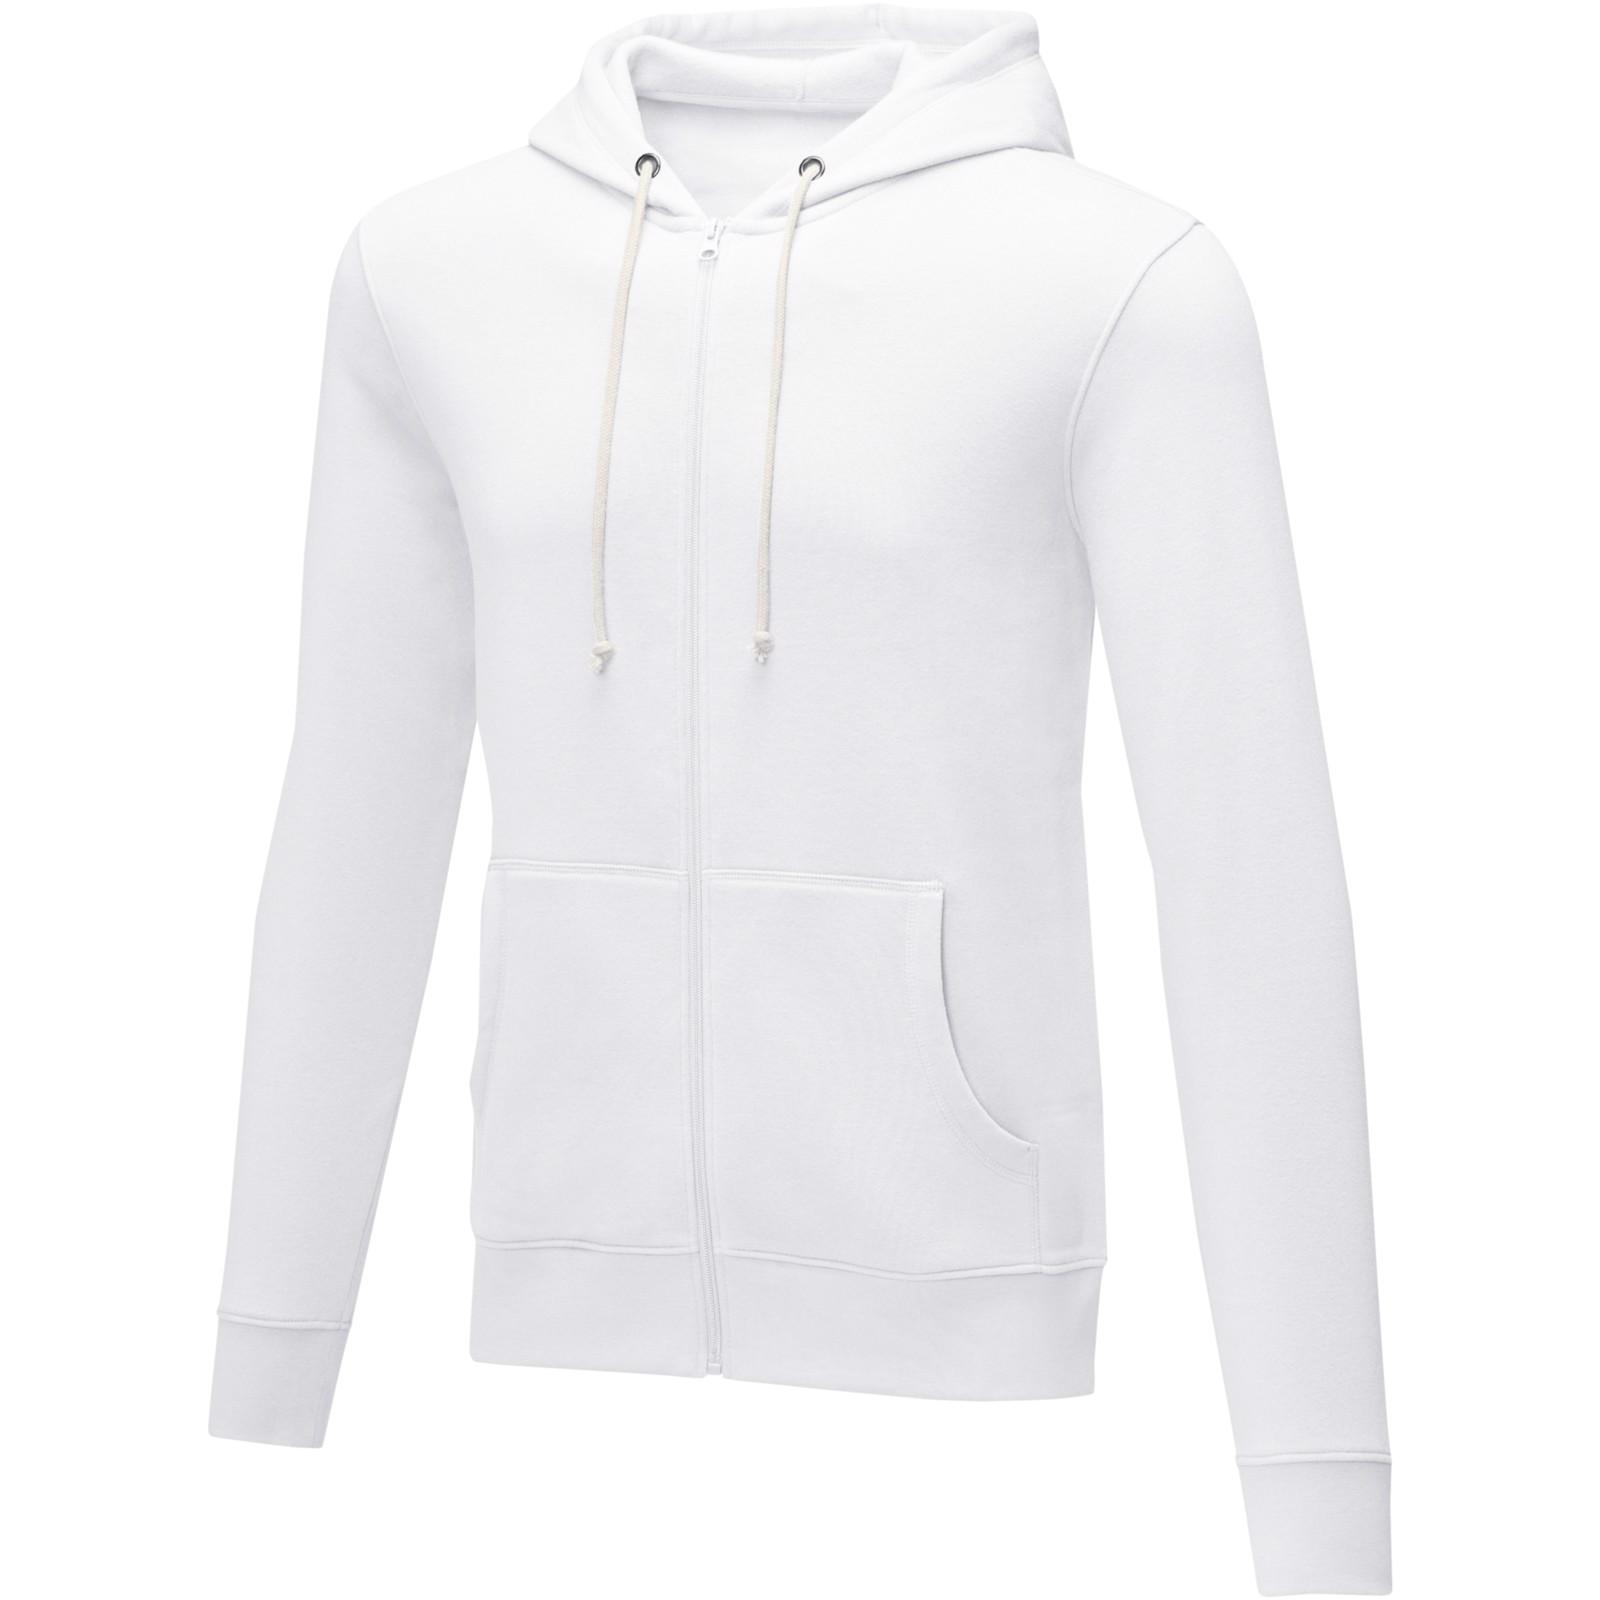 Theron men's full zip hoodie - White / L